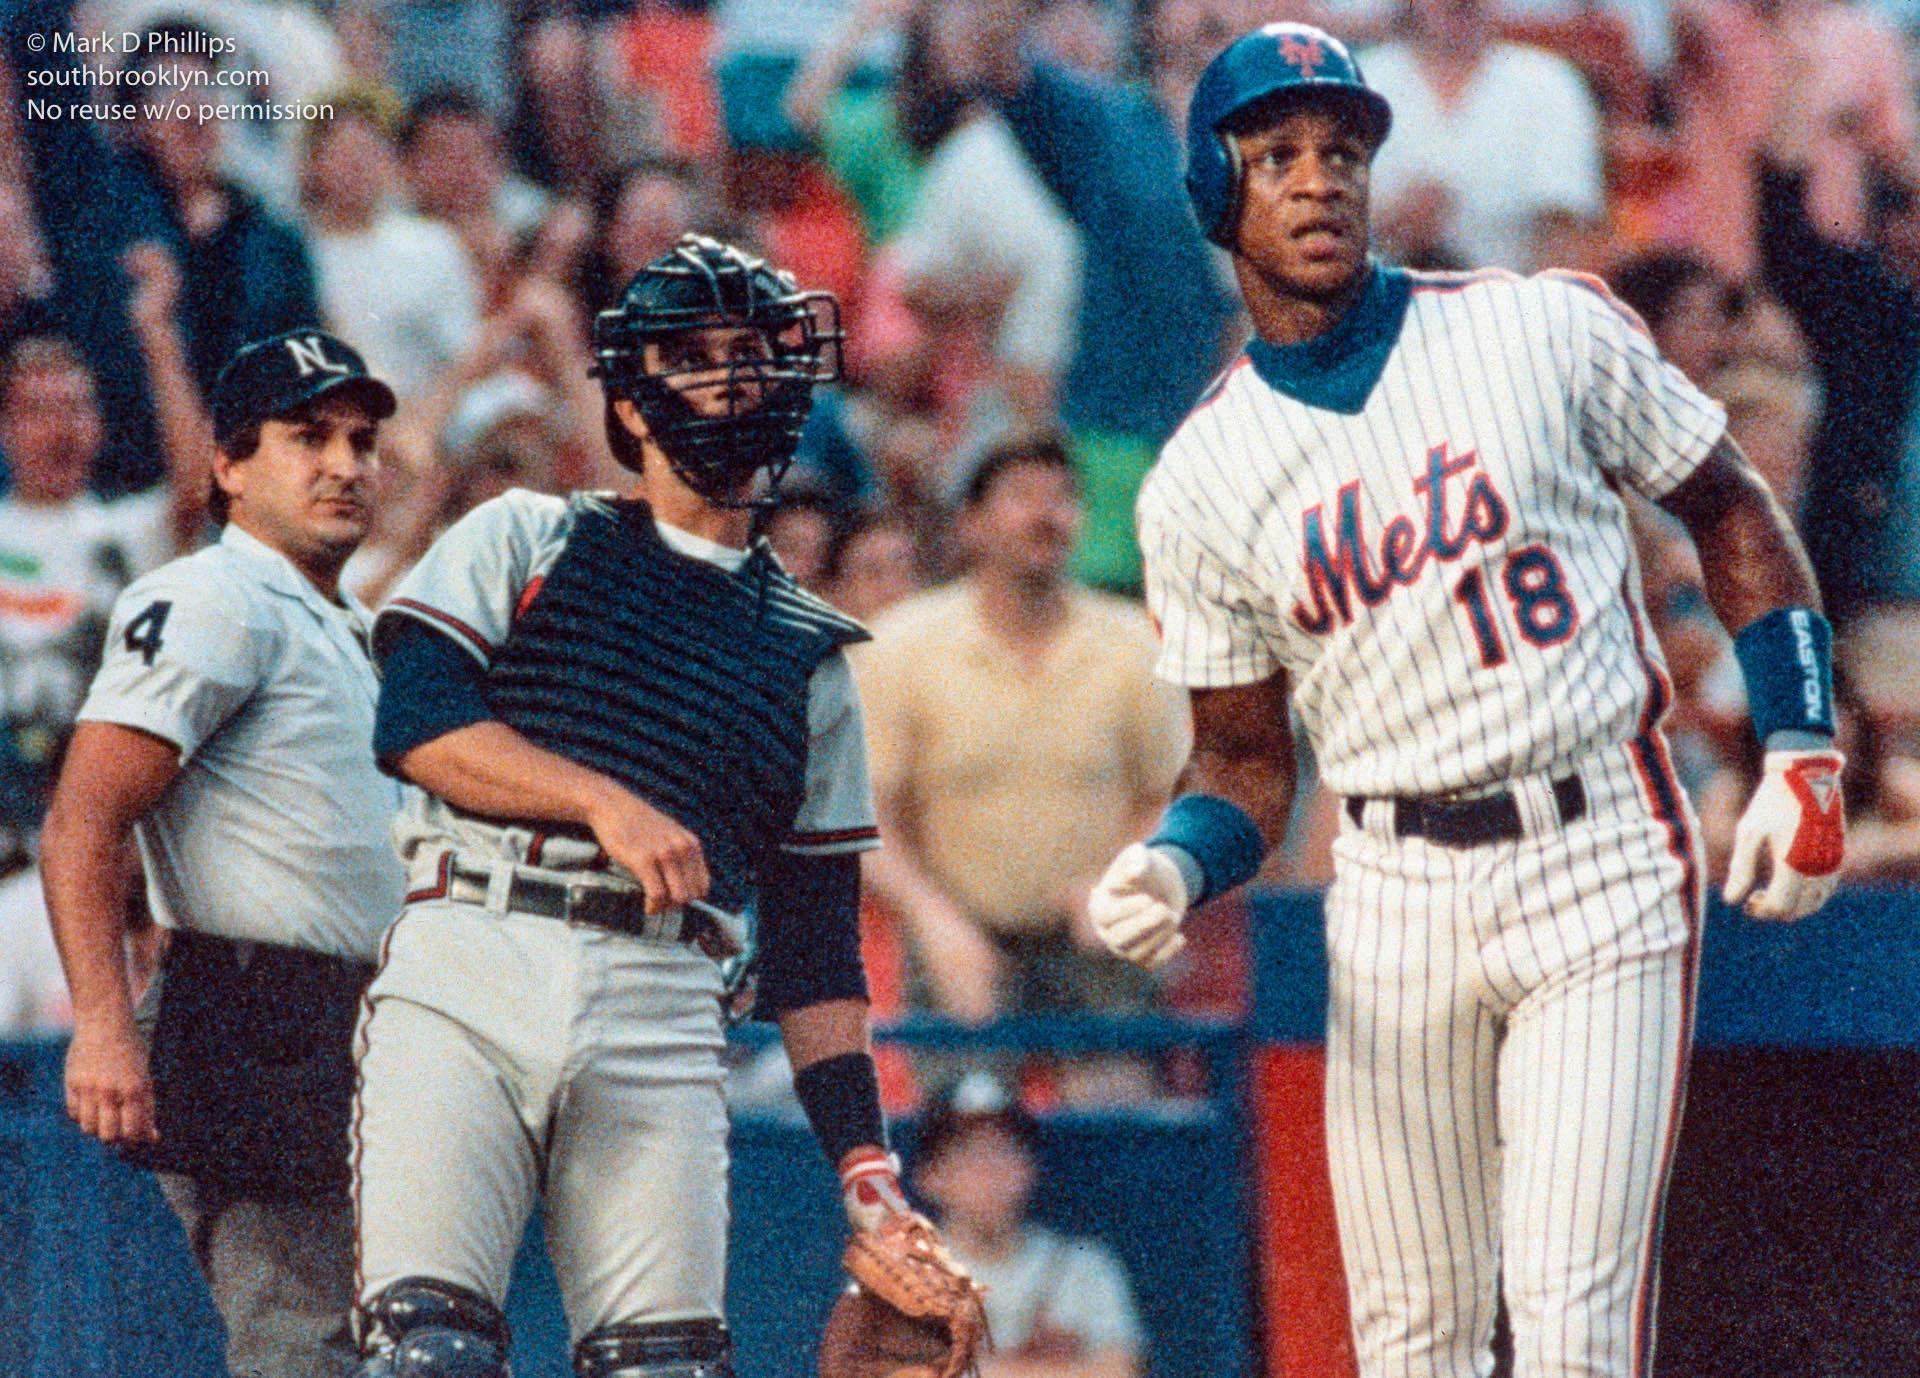 New York Mets Daryl Strawberry